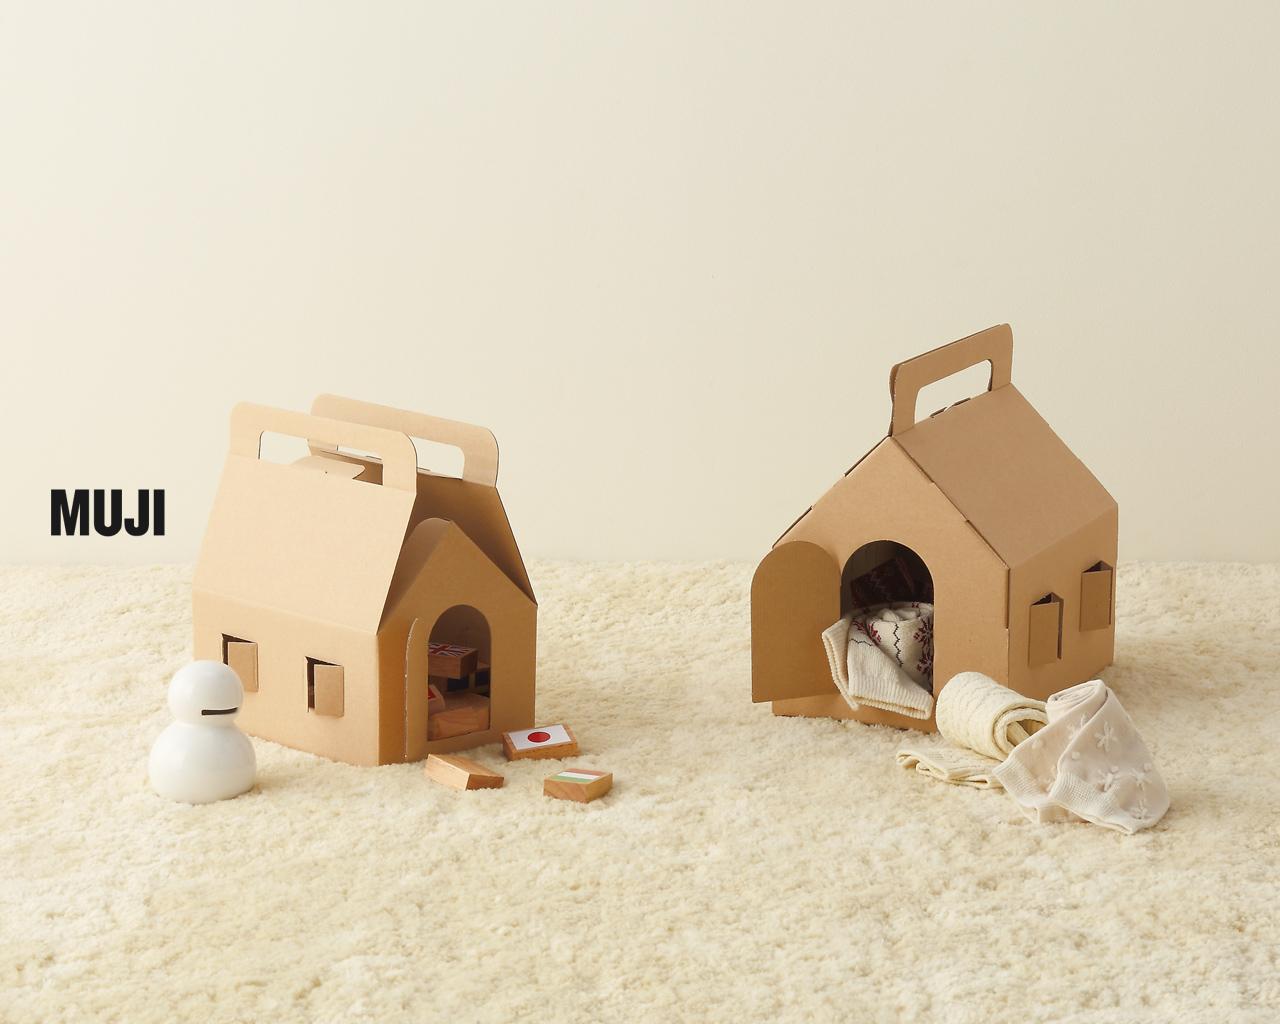 pinkcross design muji mujirushi ryohin productos de. Black Bedroom Furniture Sets. Home Design Ideas